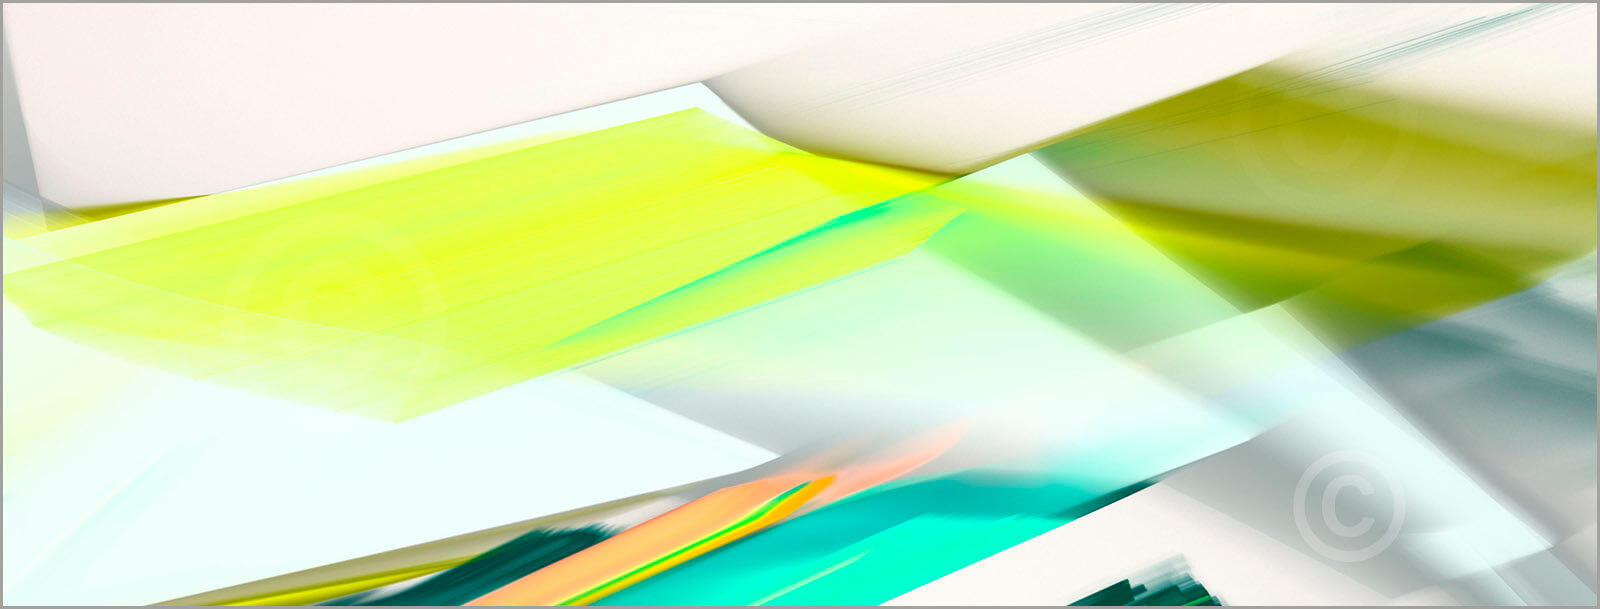 Colorshapes_F2_9829_XL